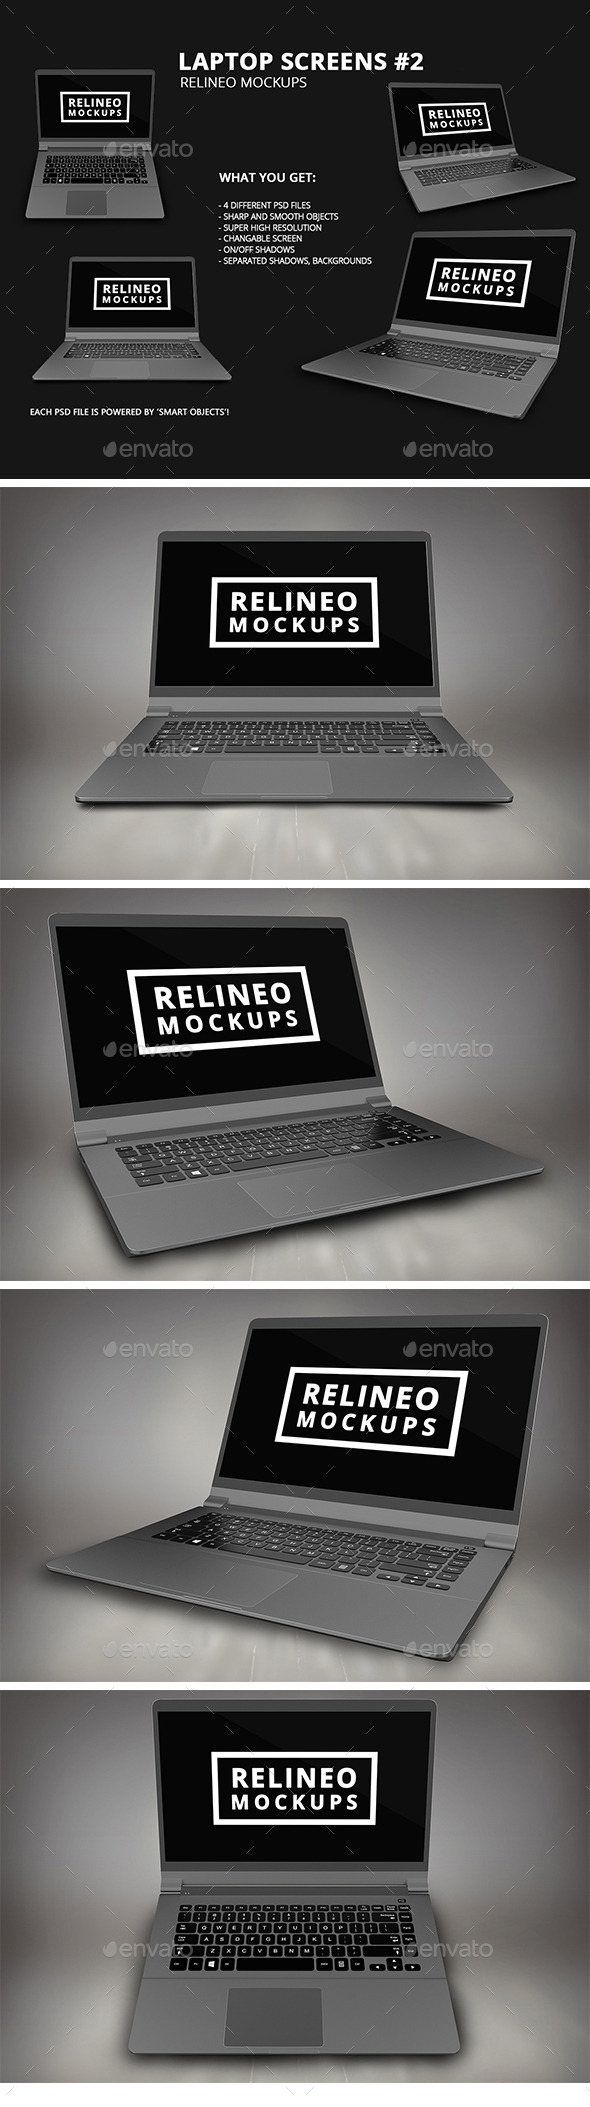 Windows Laptop Display Mock-up Pack Vol.2 - Laptop Displays